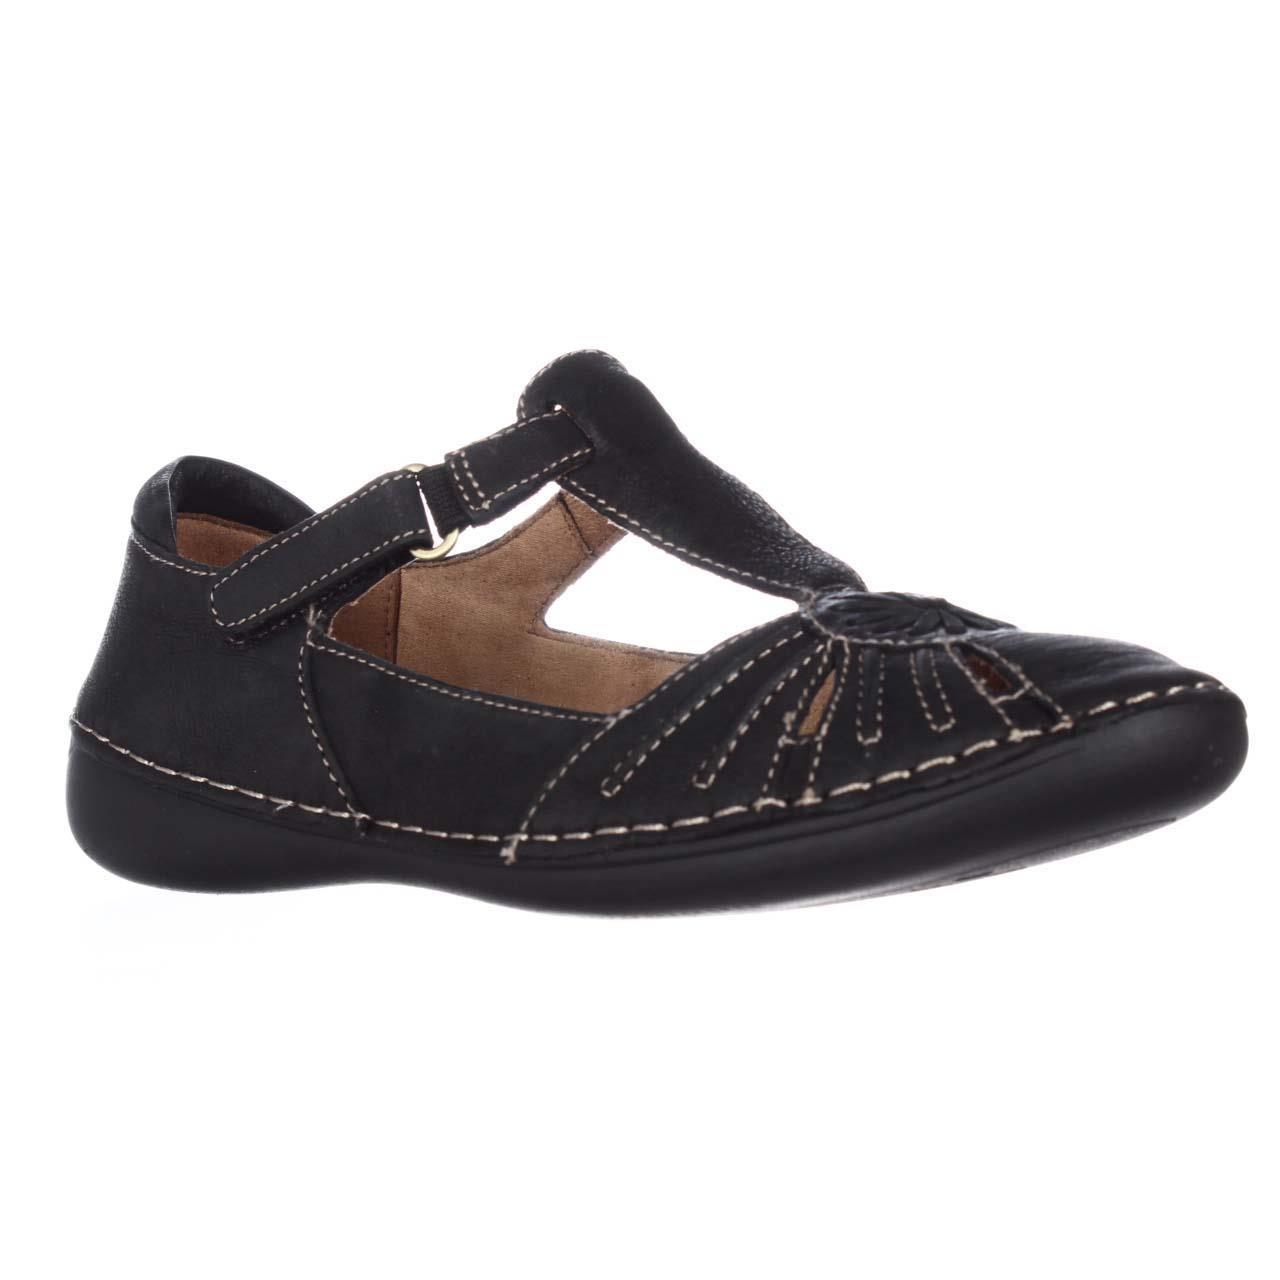 Naturalizer Black Mary Jane Shoes